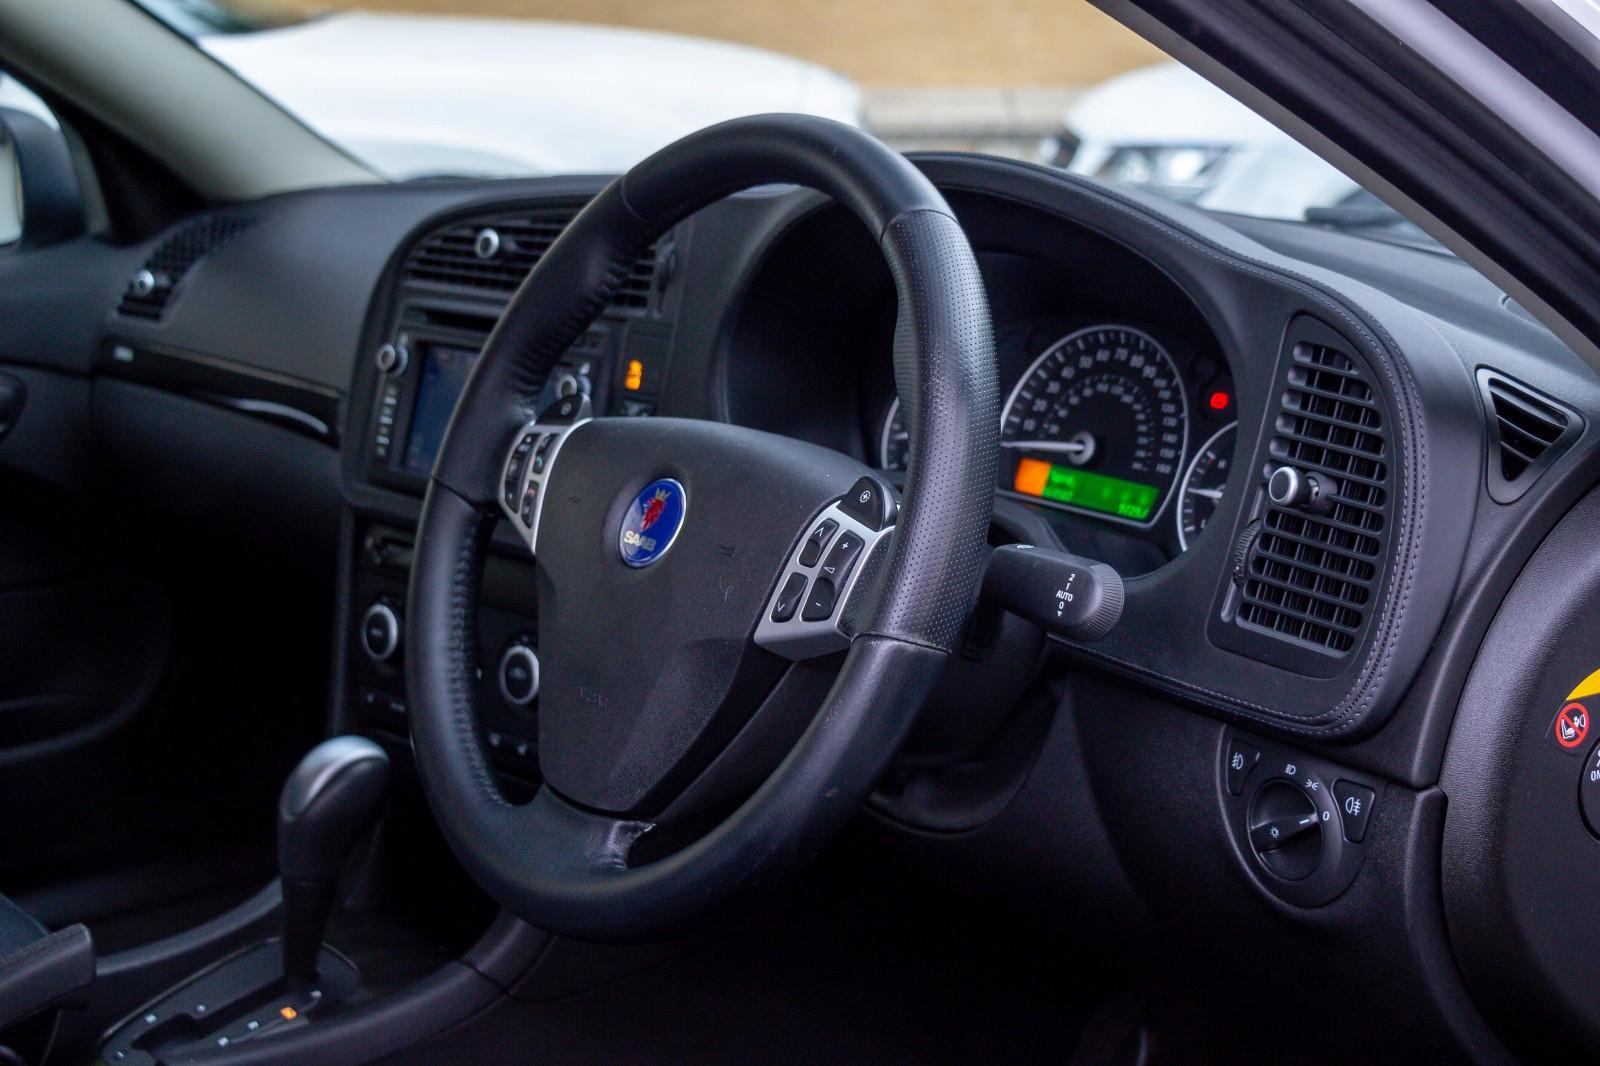 2010 Saab 9-3 AERO 2.8T V6 XWD CARLSSON Petrol Automatic – Morgan Cars 9 Mound Road, Warrenpoint, Newry BT34 3LW, UK full